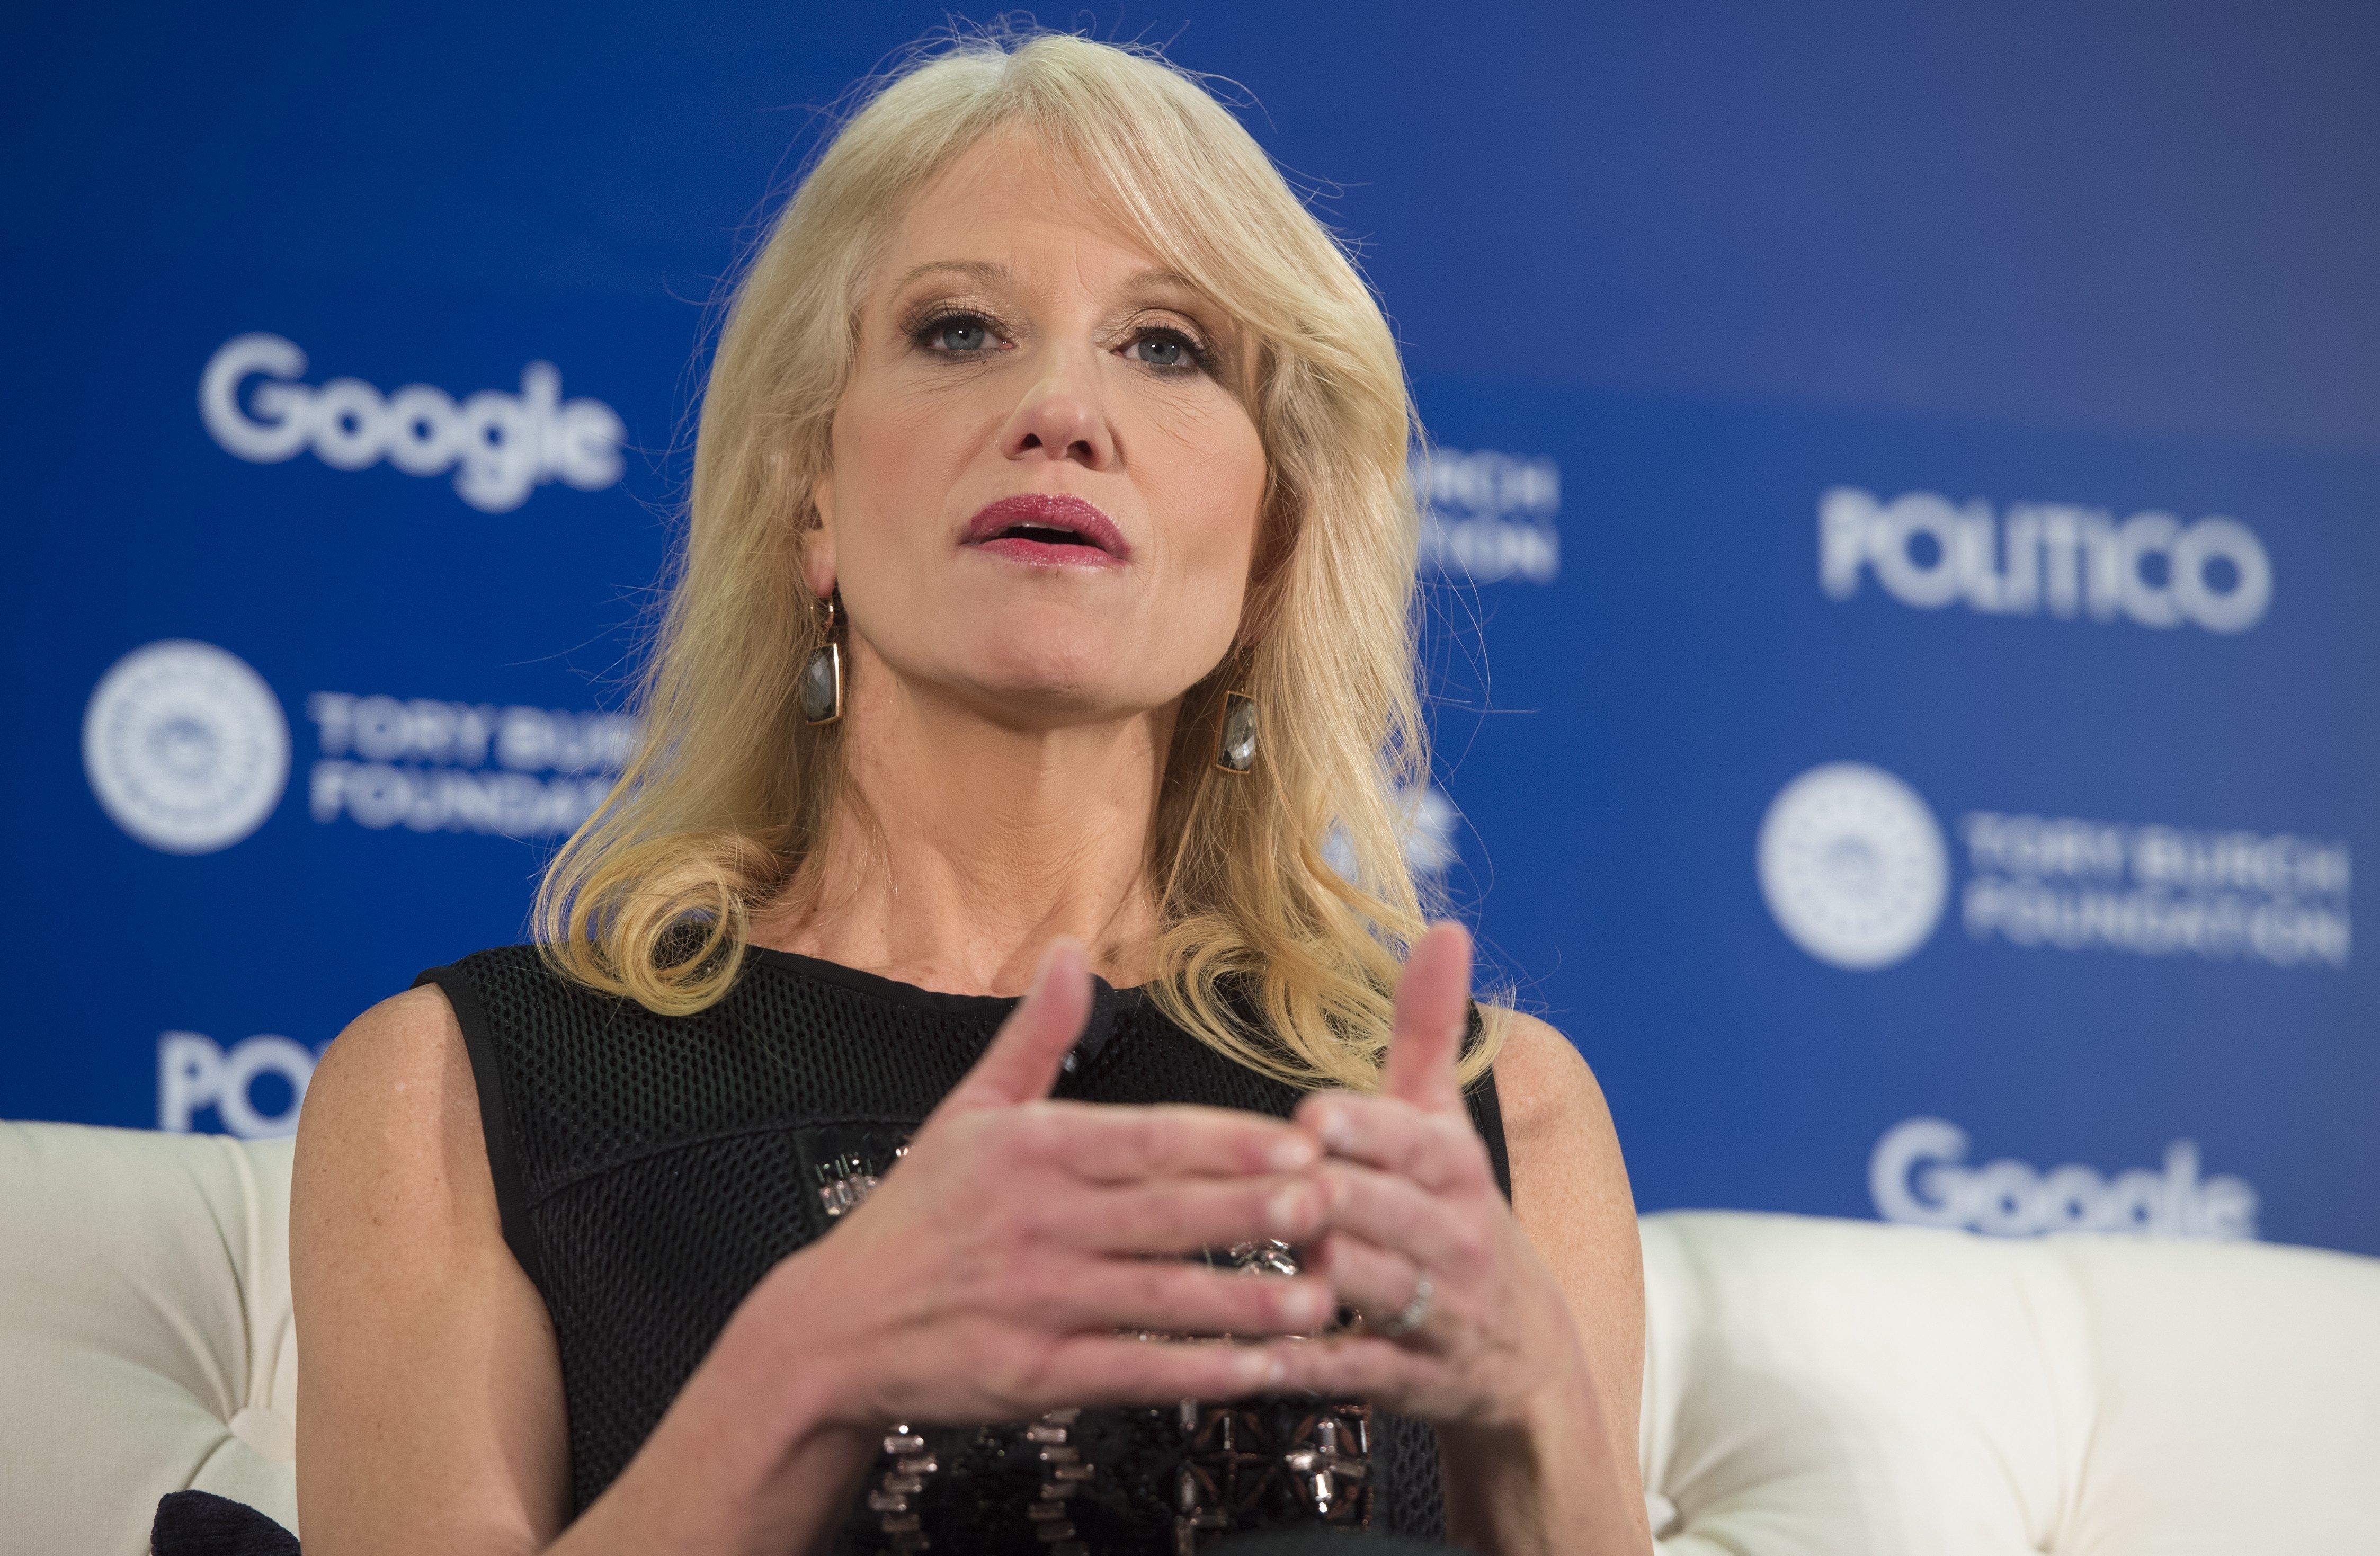 Kellyanne Conway, speaking at Politico's Women Rule Summit in Washington, D.C., on Wednesday.